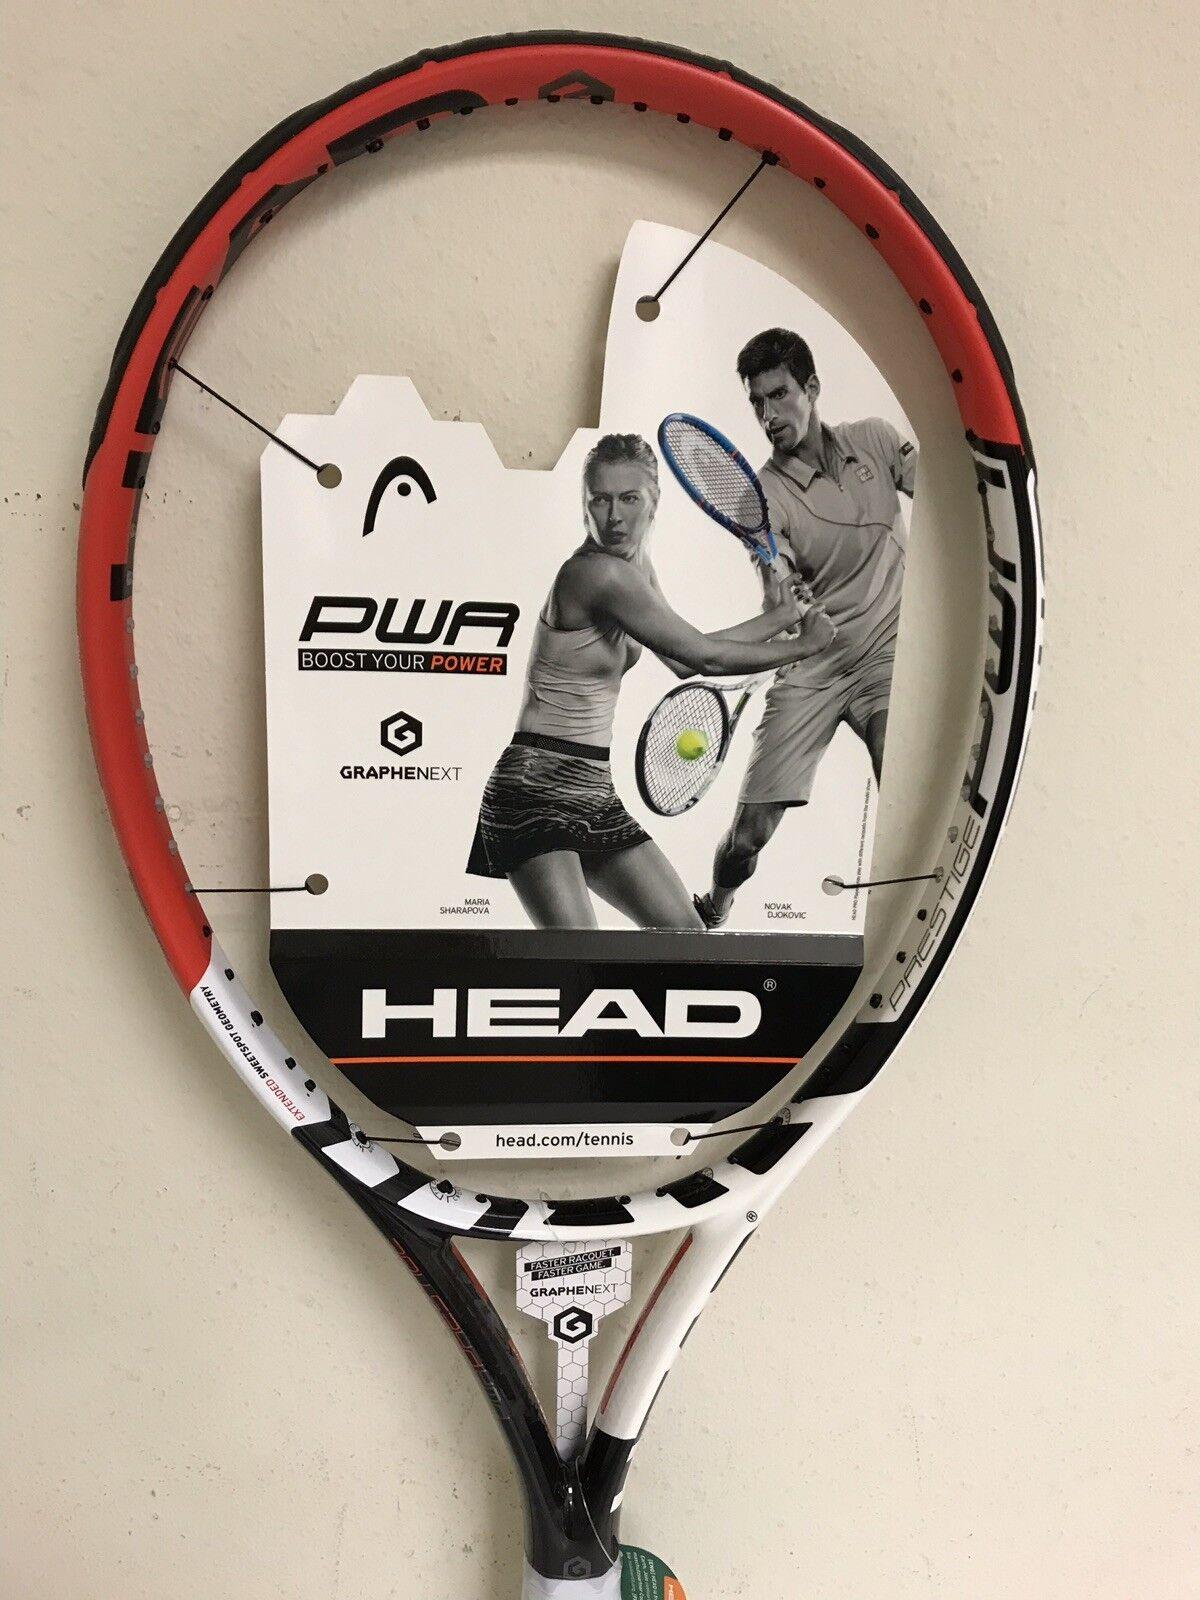 Head Graphene Xt Prestige Power Tenis Raqueta Agarre Talla 4 1 4